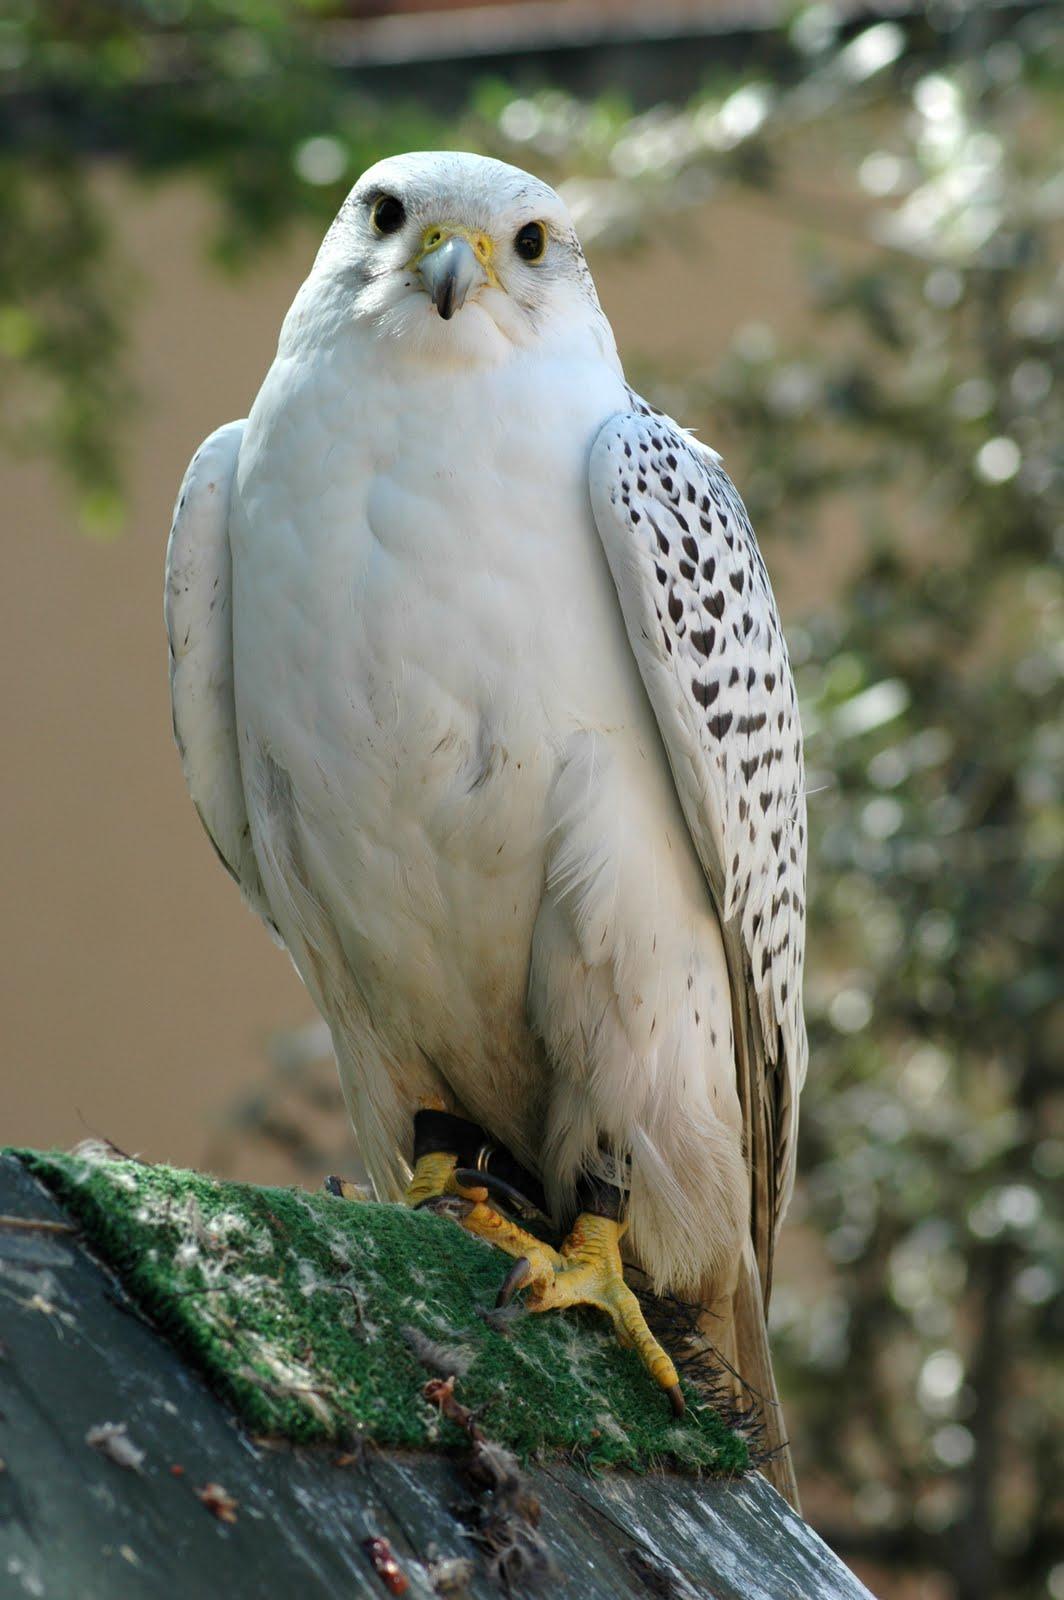 halcon gerifalte ave